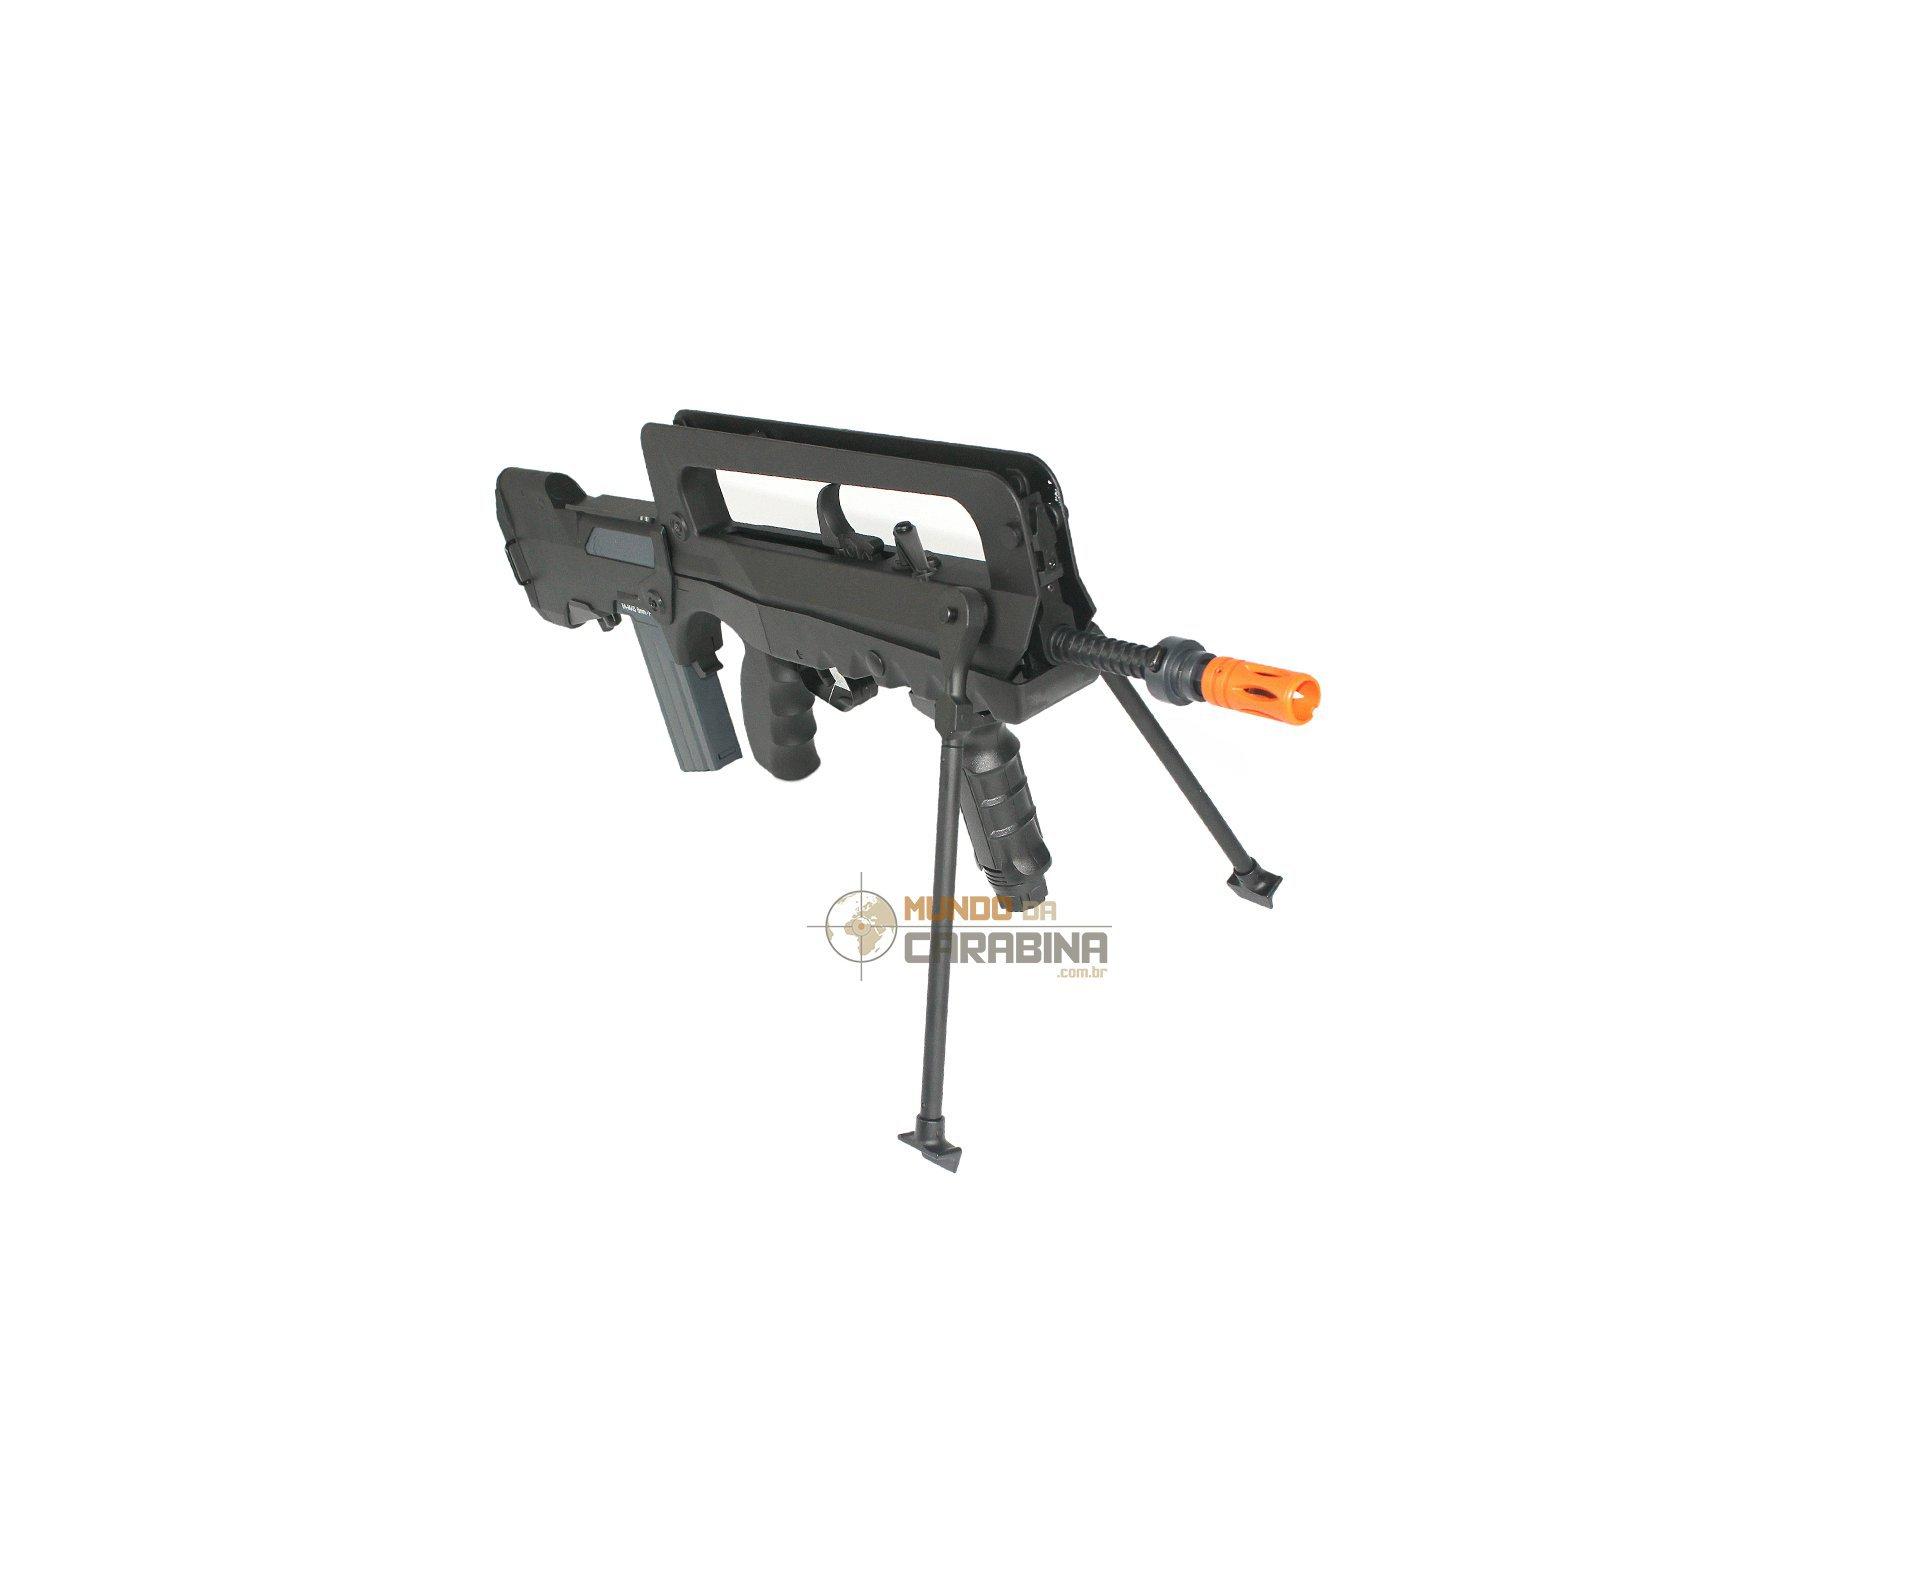 Rifle De Airsoft Famas F1 - Cal 6,0 Mm - Cyber Gun - 220 V